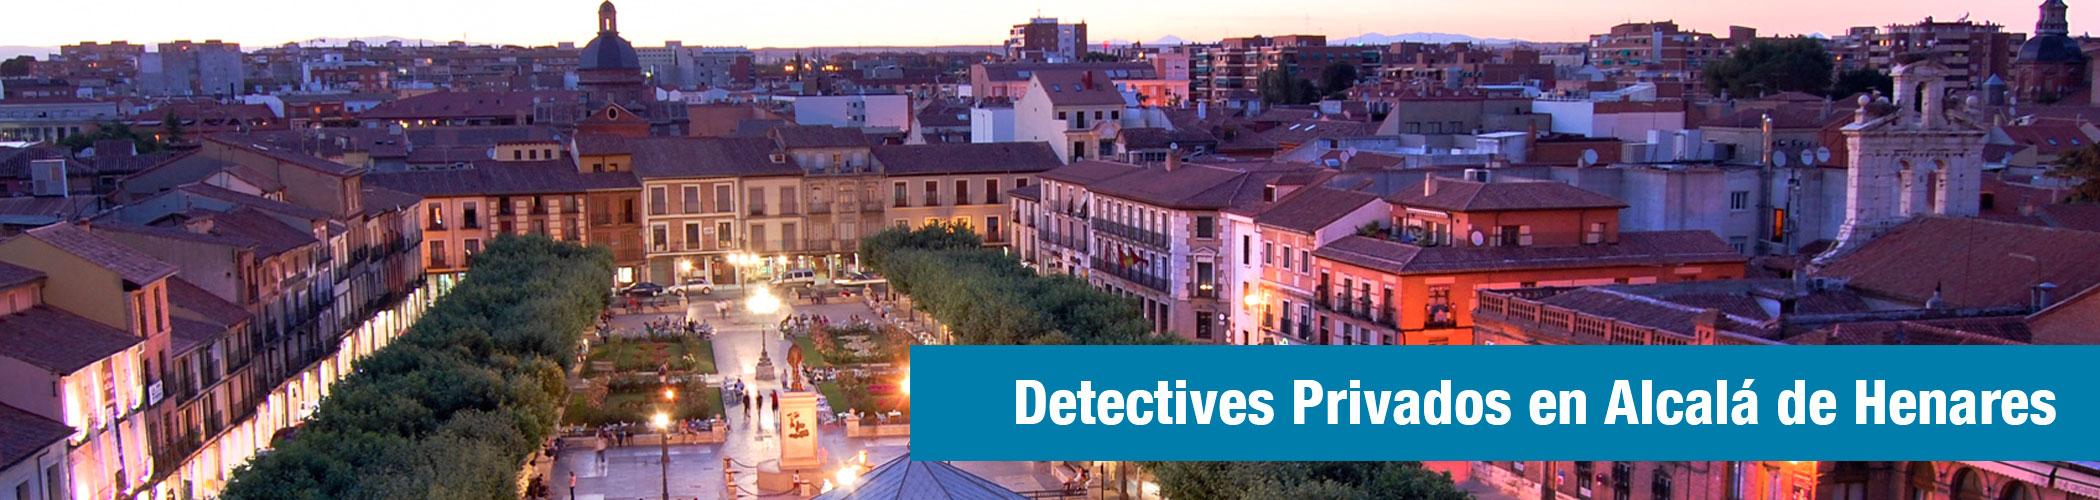 Detectives en Alcala de Henares